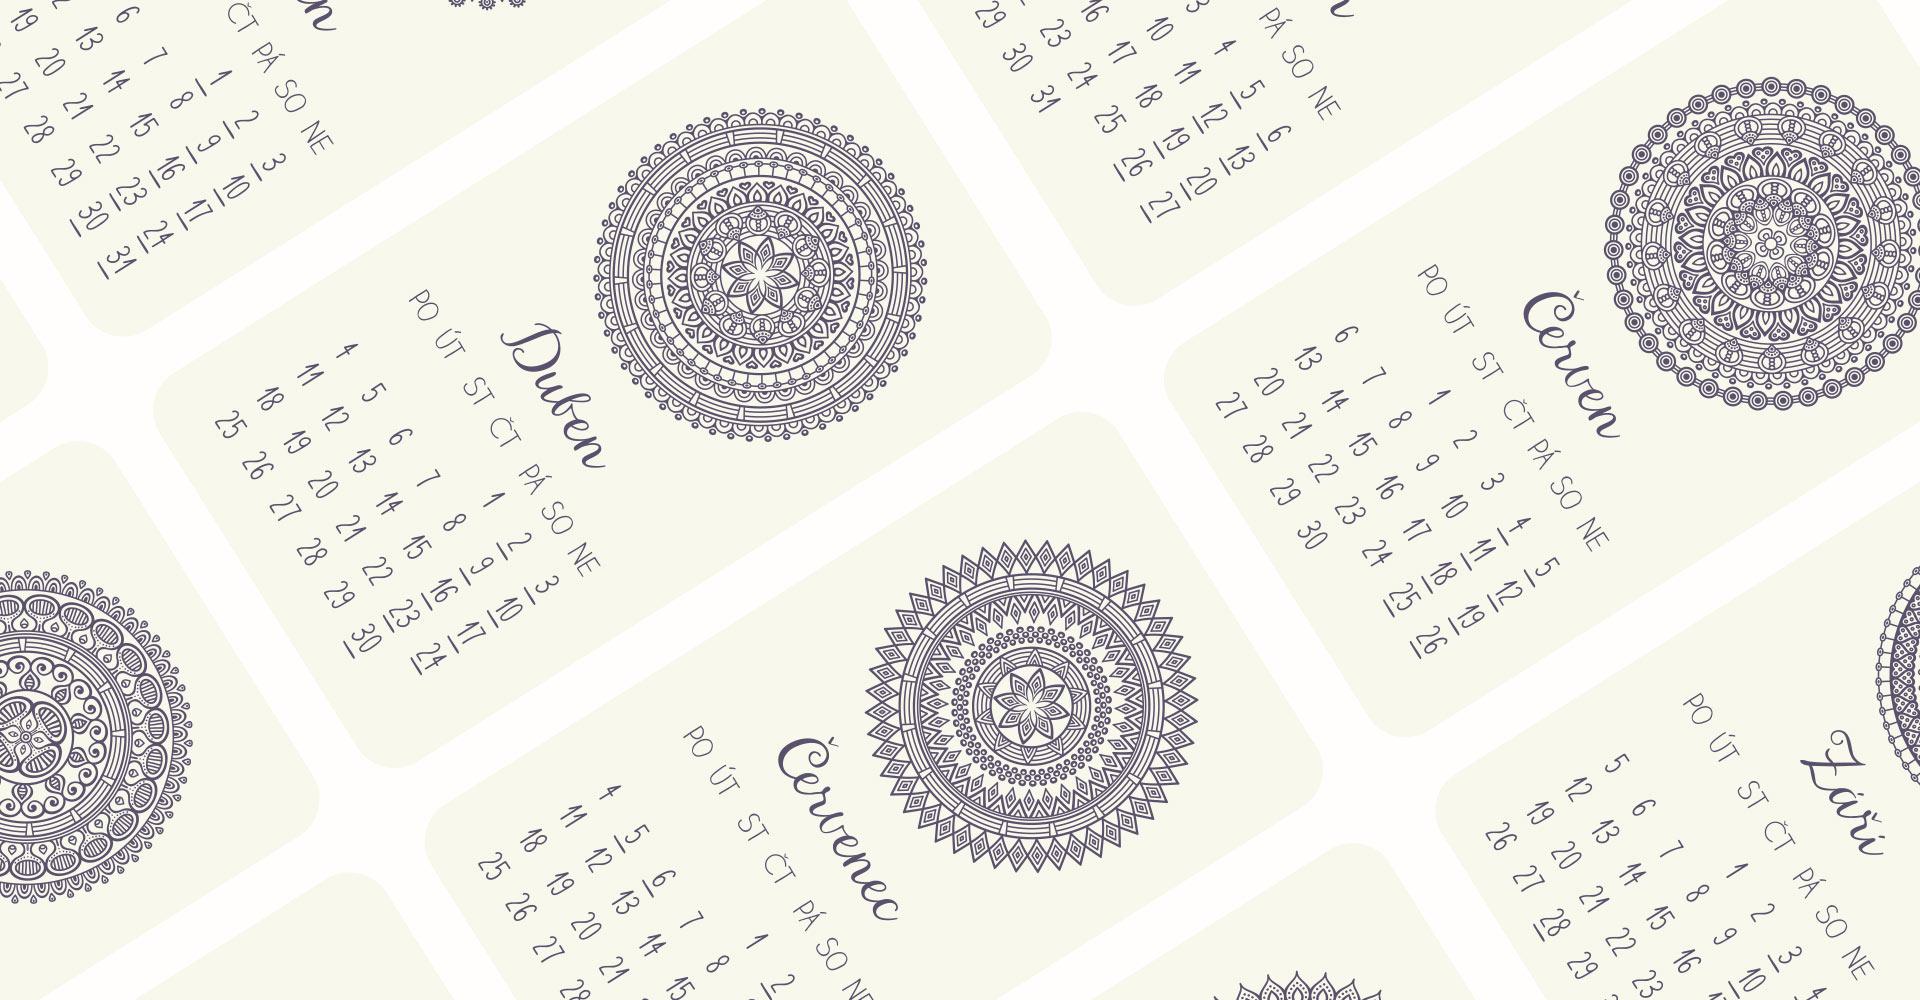 mandalovy-kalendar-nahled